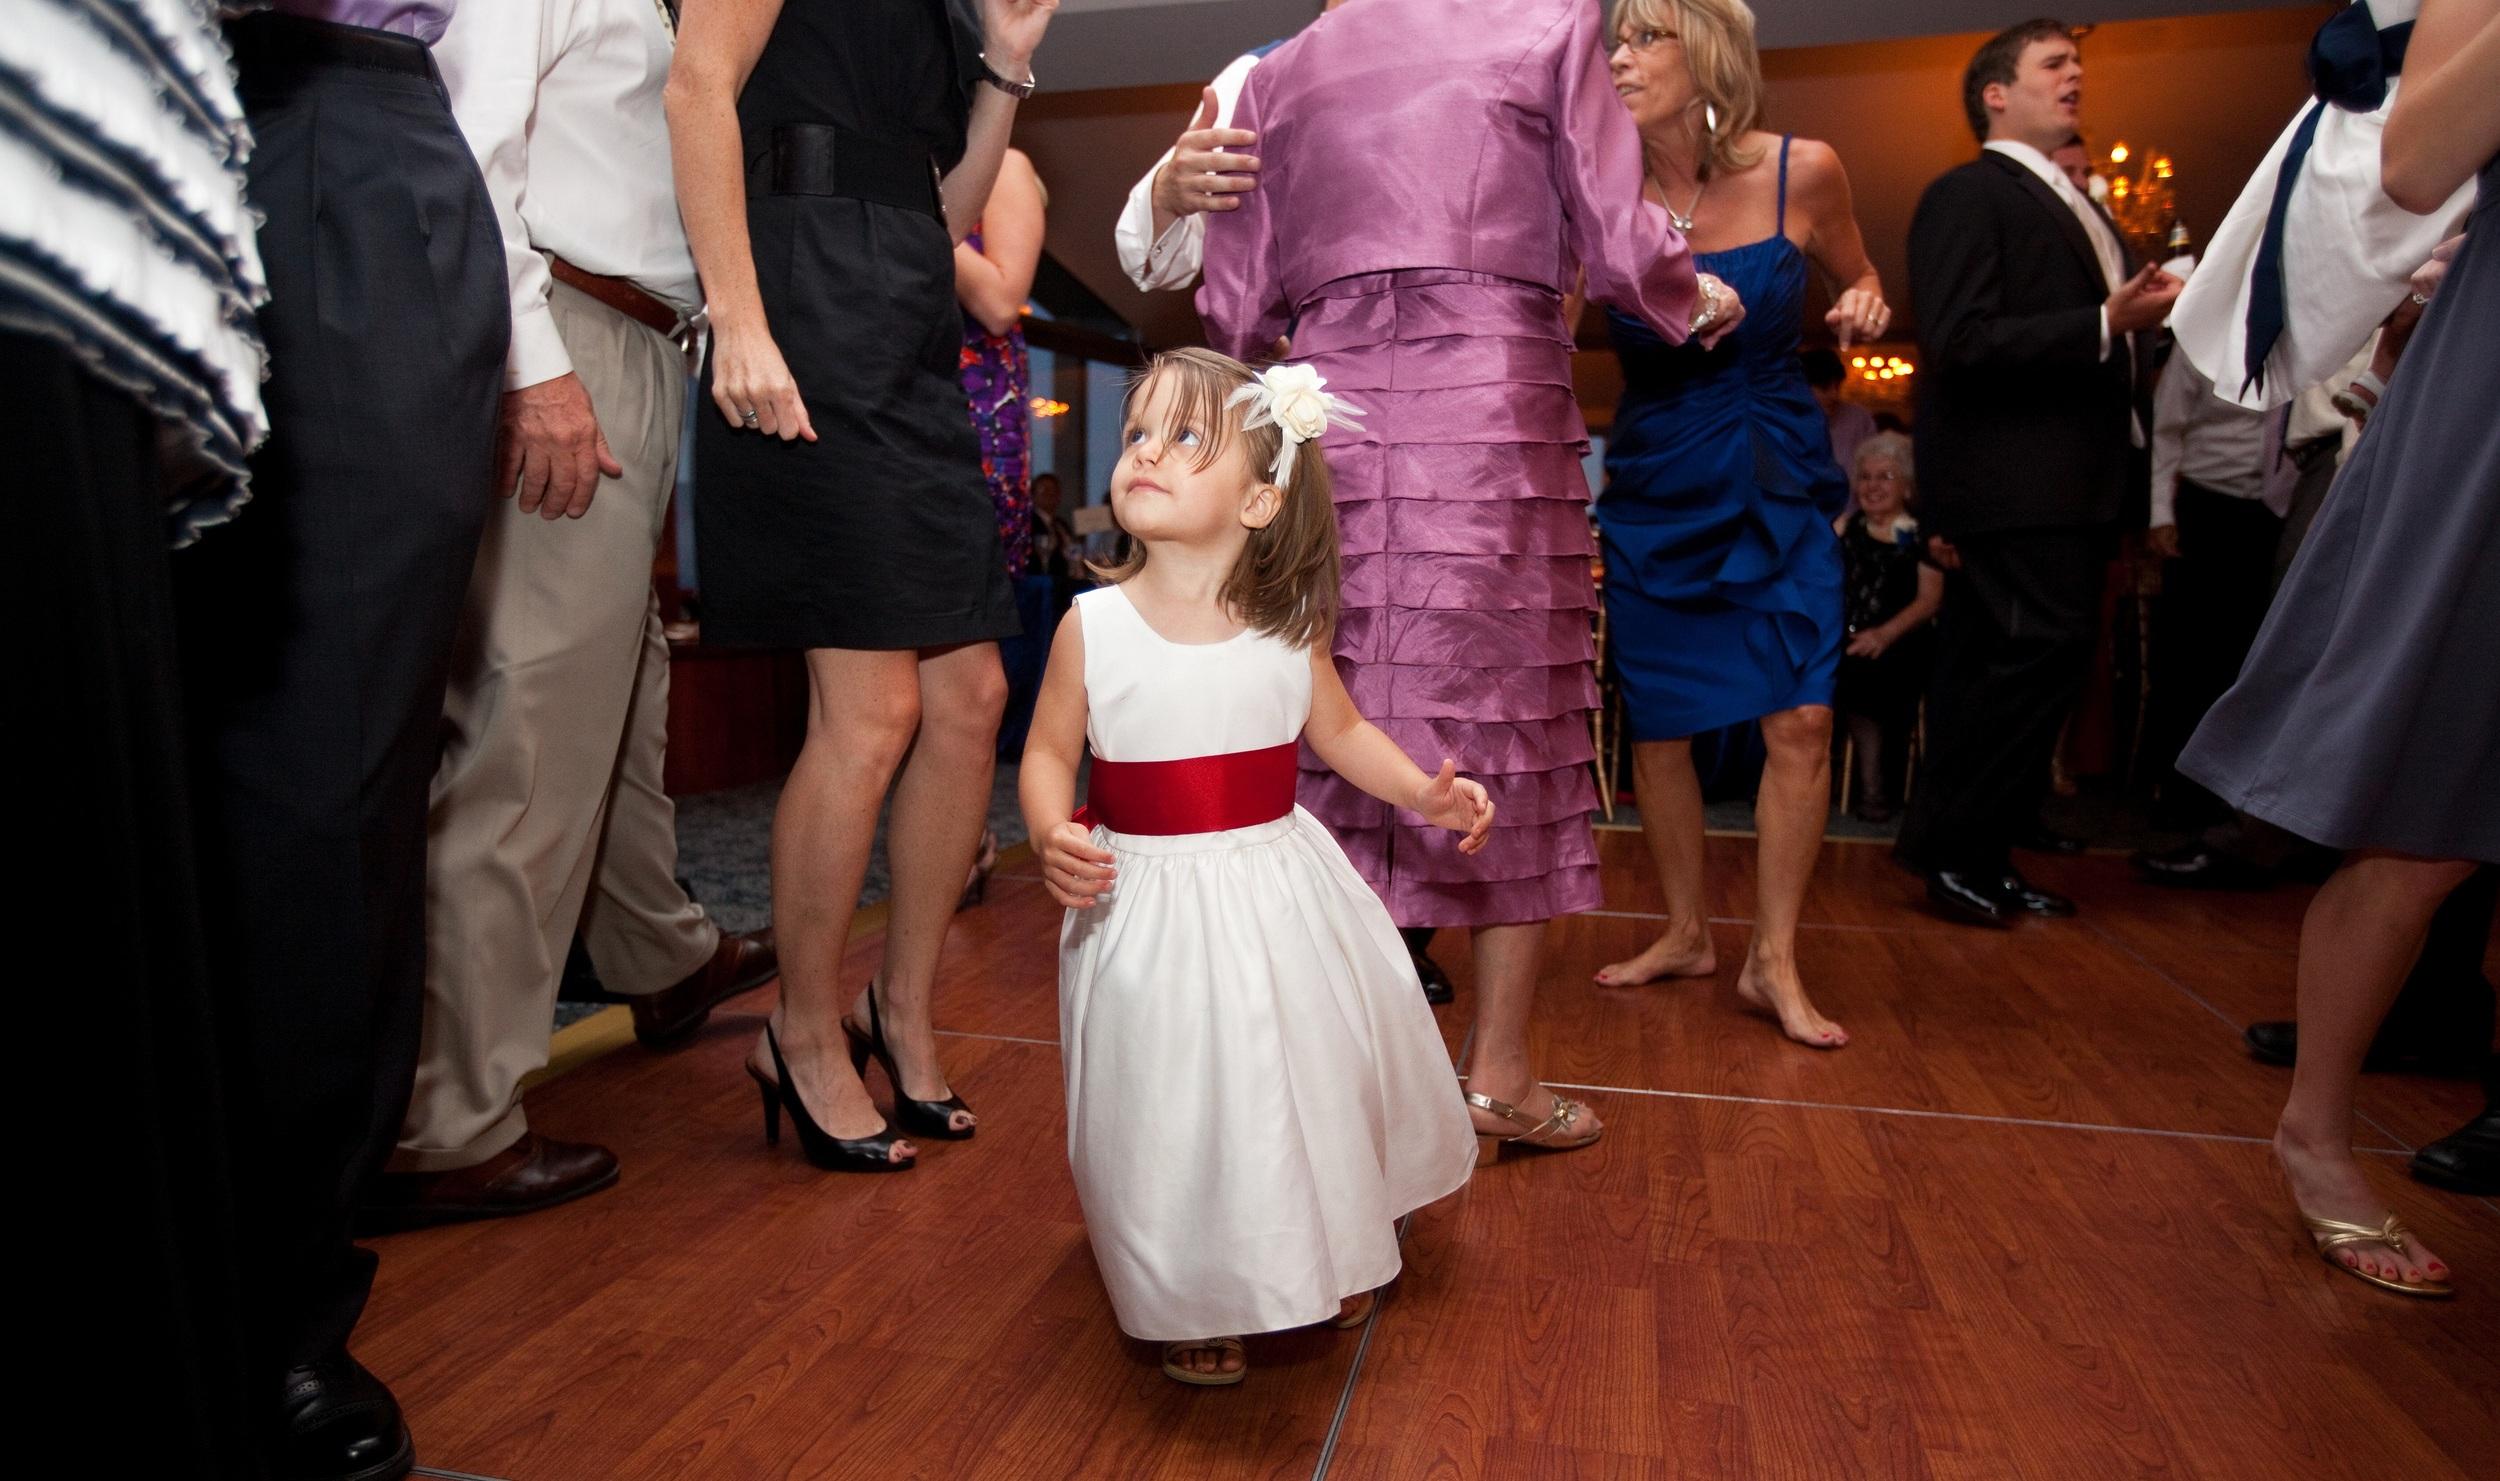 SG_Erinn&Ryan small girl on dance floor looking up.jpg